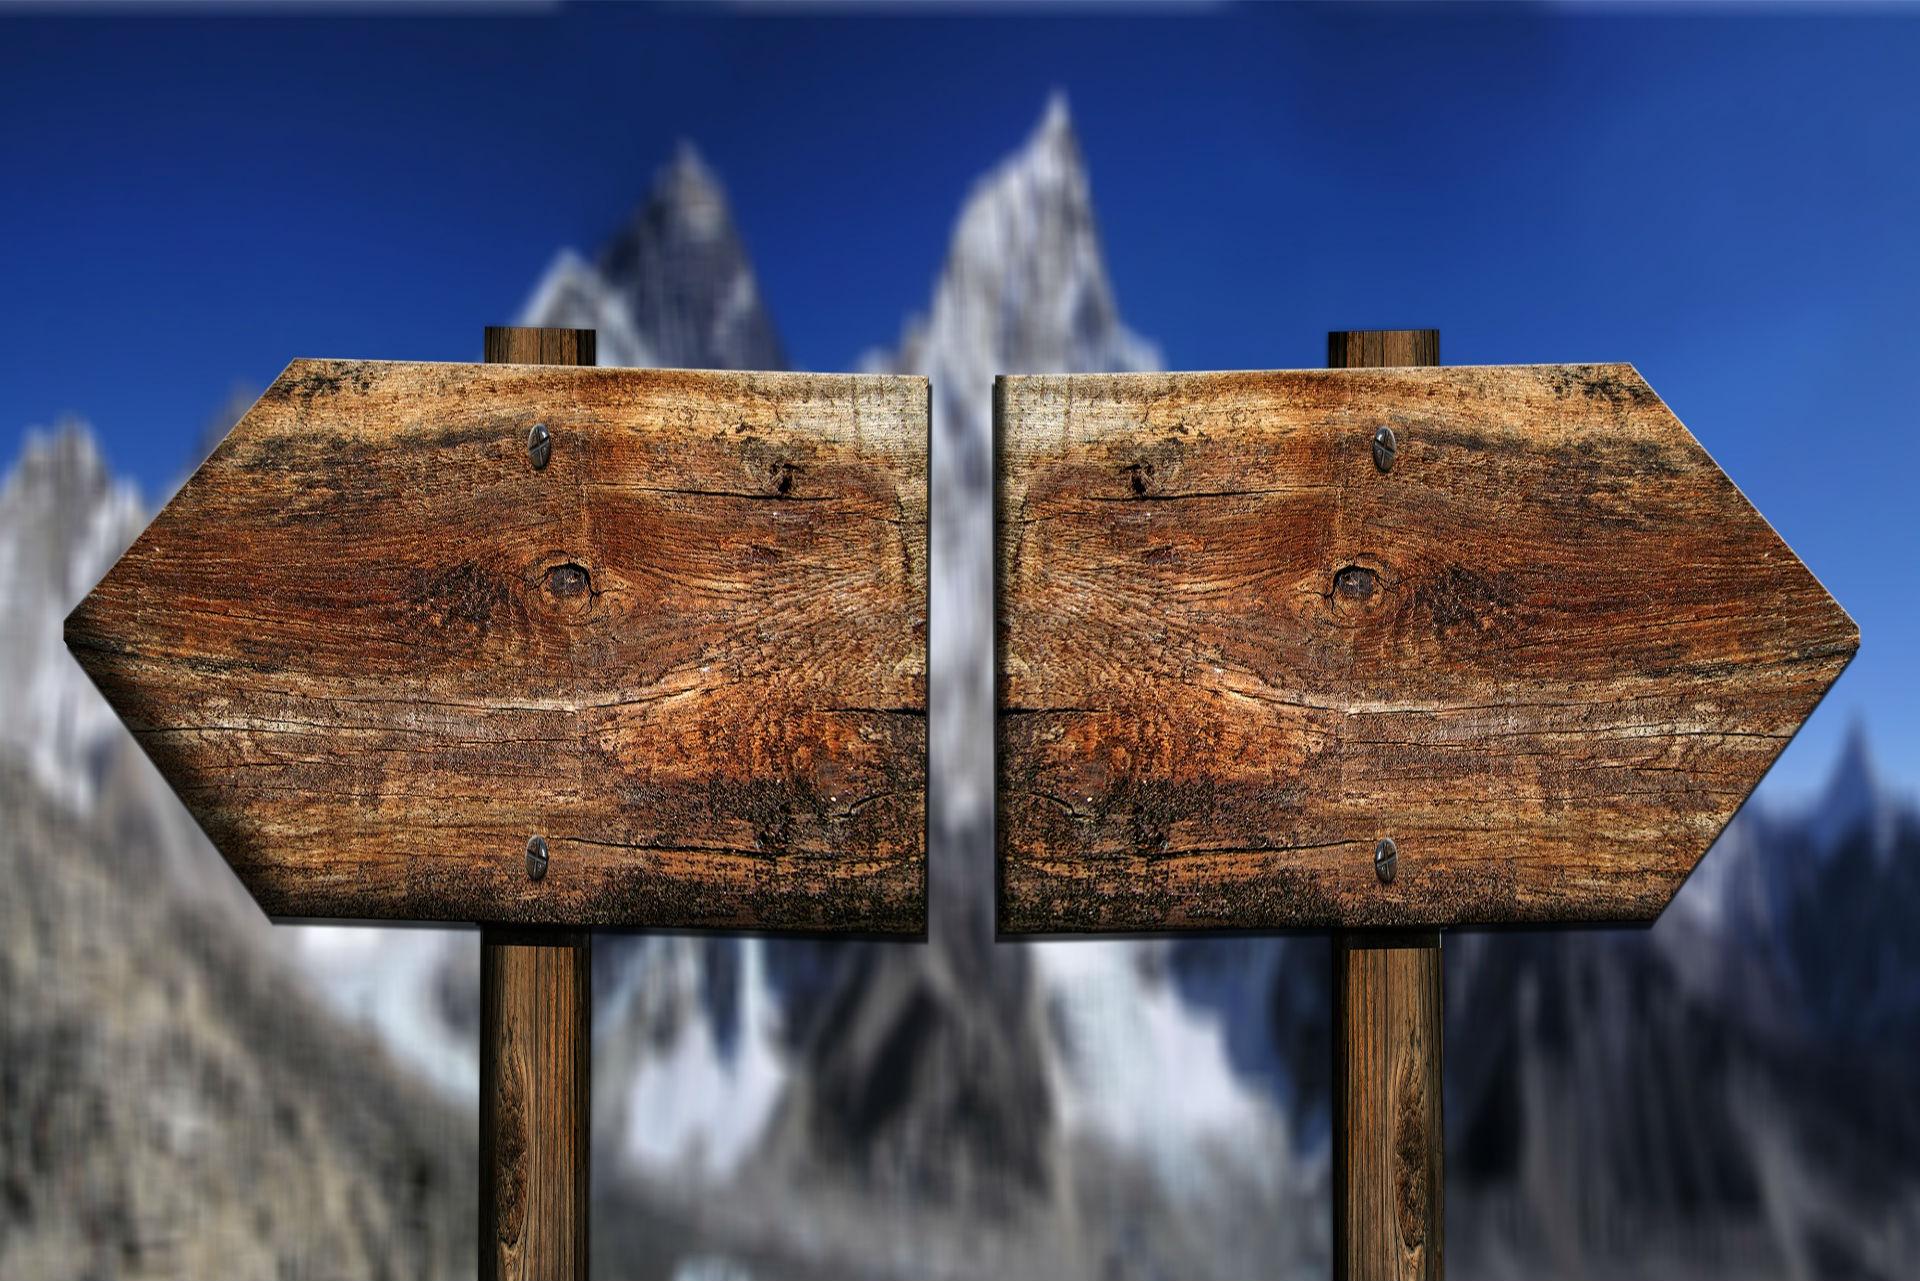 Add-on vs. User Subscription License